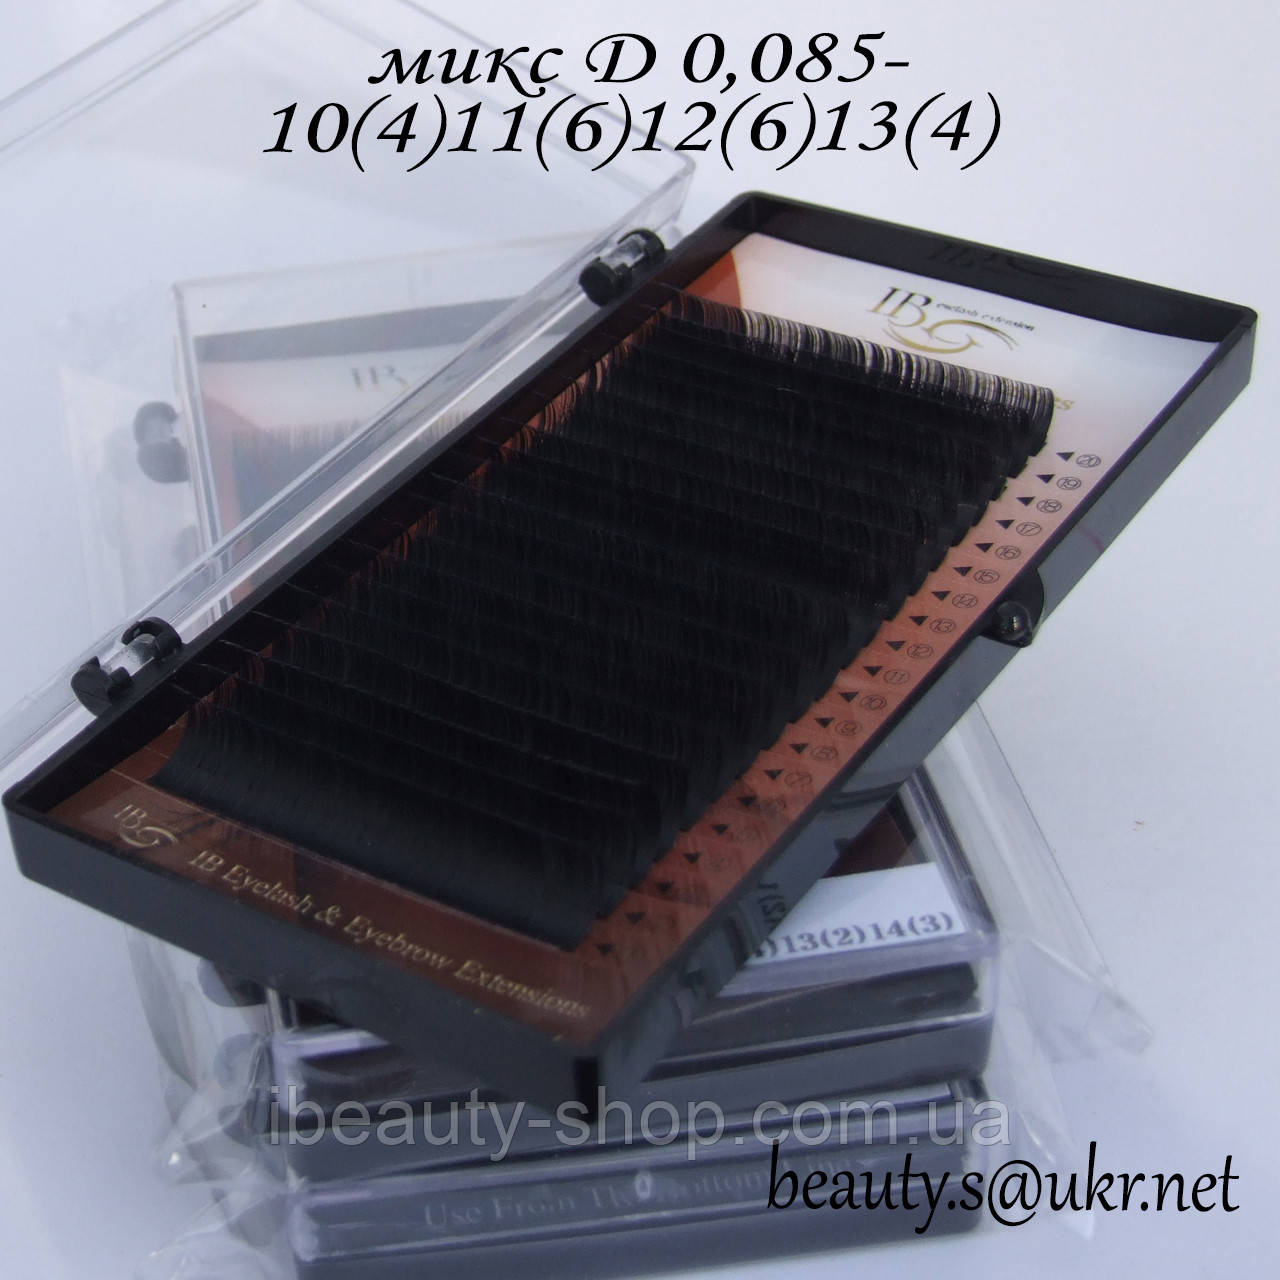 Вії I-Beauty мікс СС-0,085 10-13мм